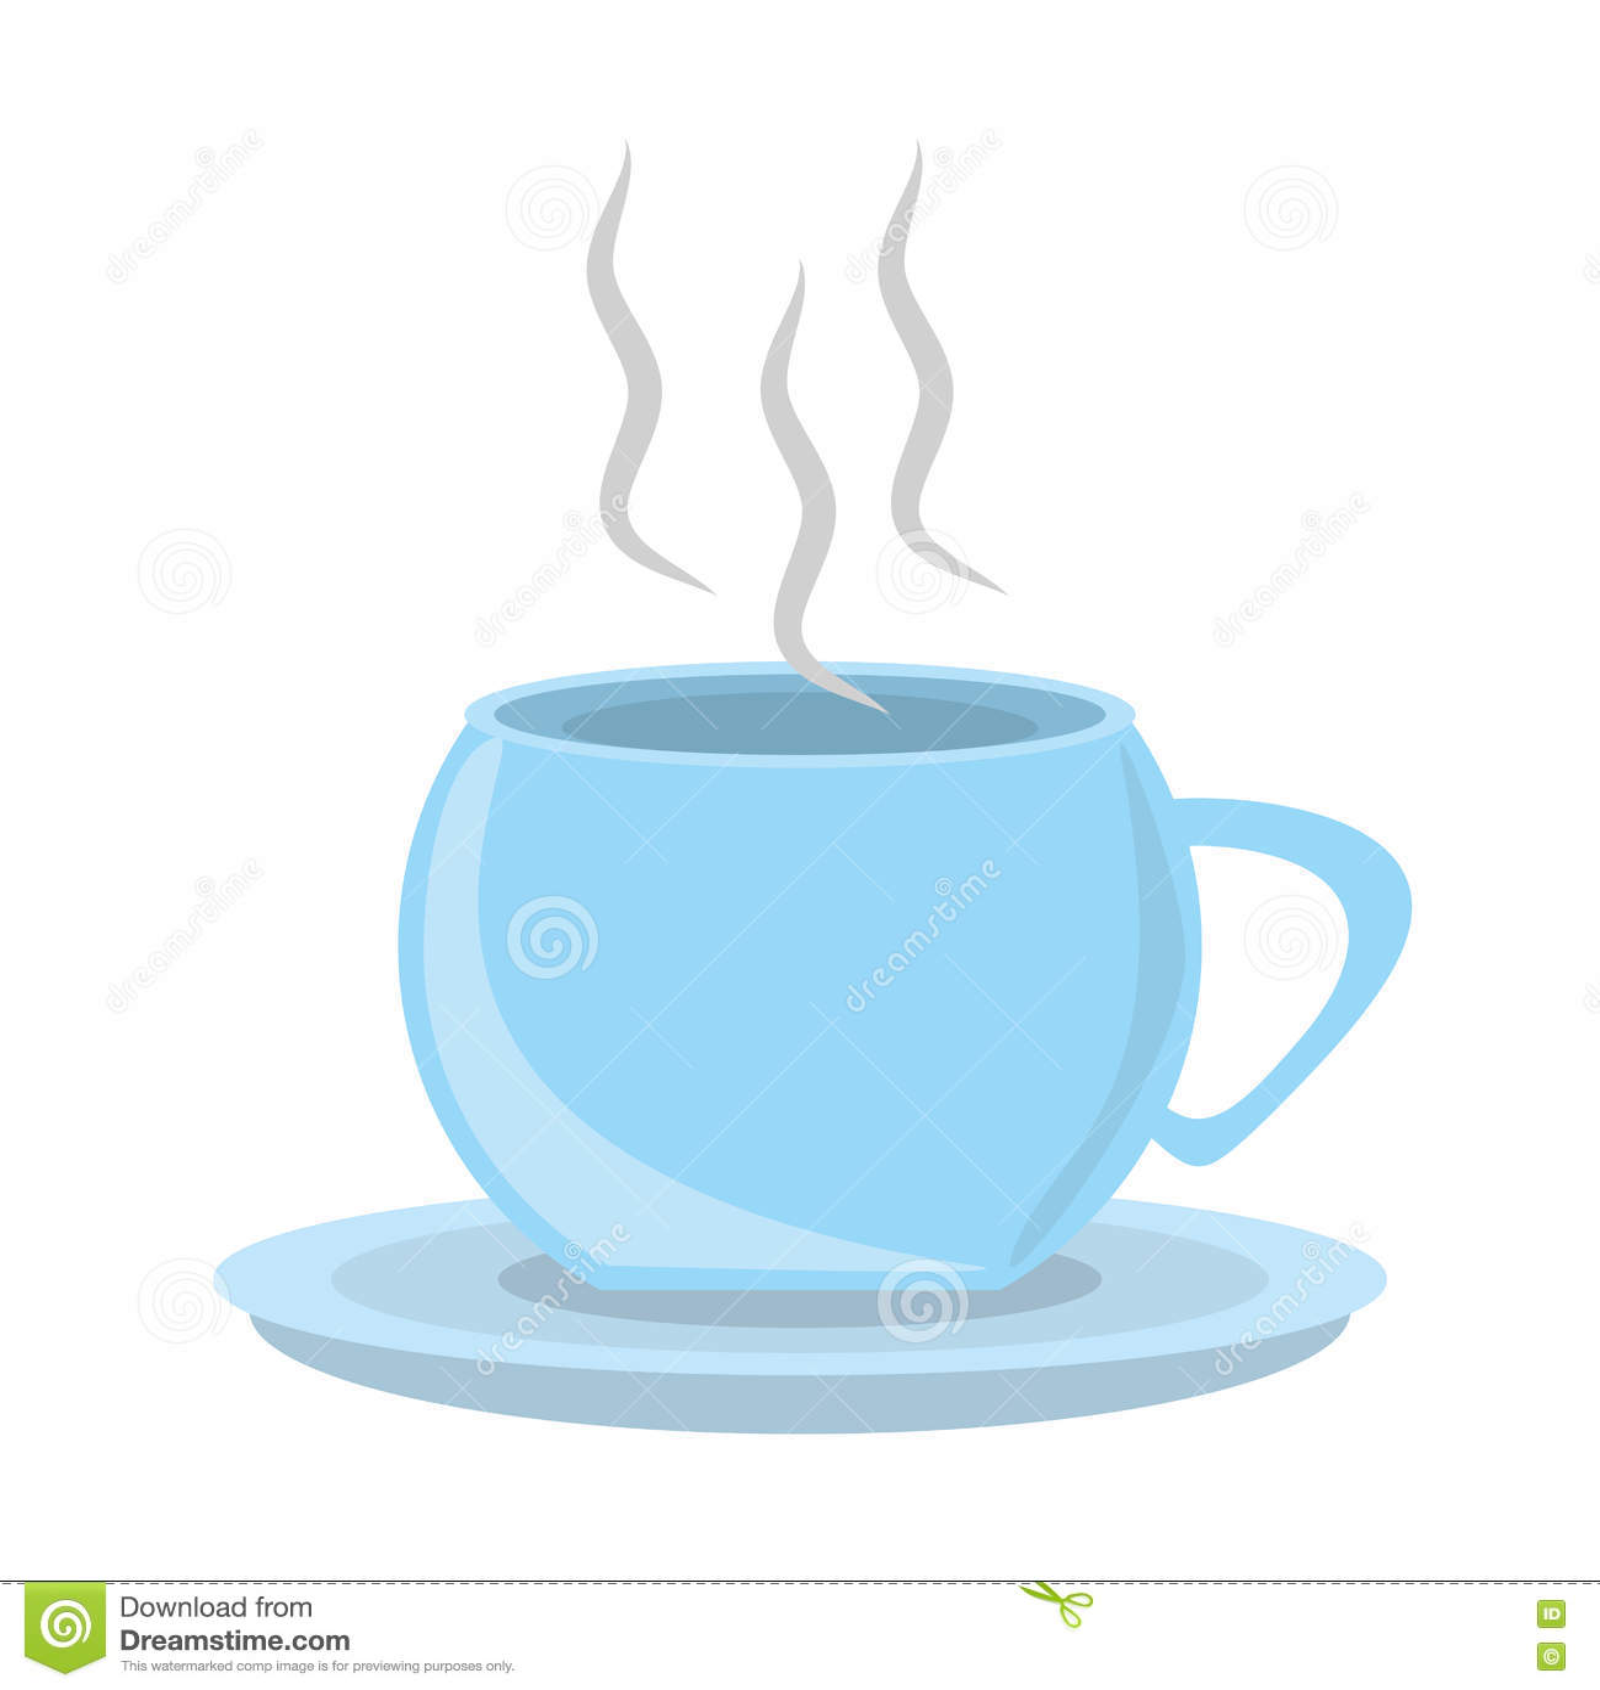 cup coffee hot porcelan plate utensil cartoon vector 81949357. Black Bedroom Furniture Sets. Home Design Ideas